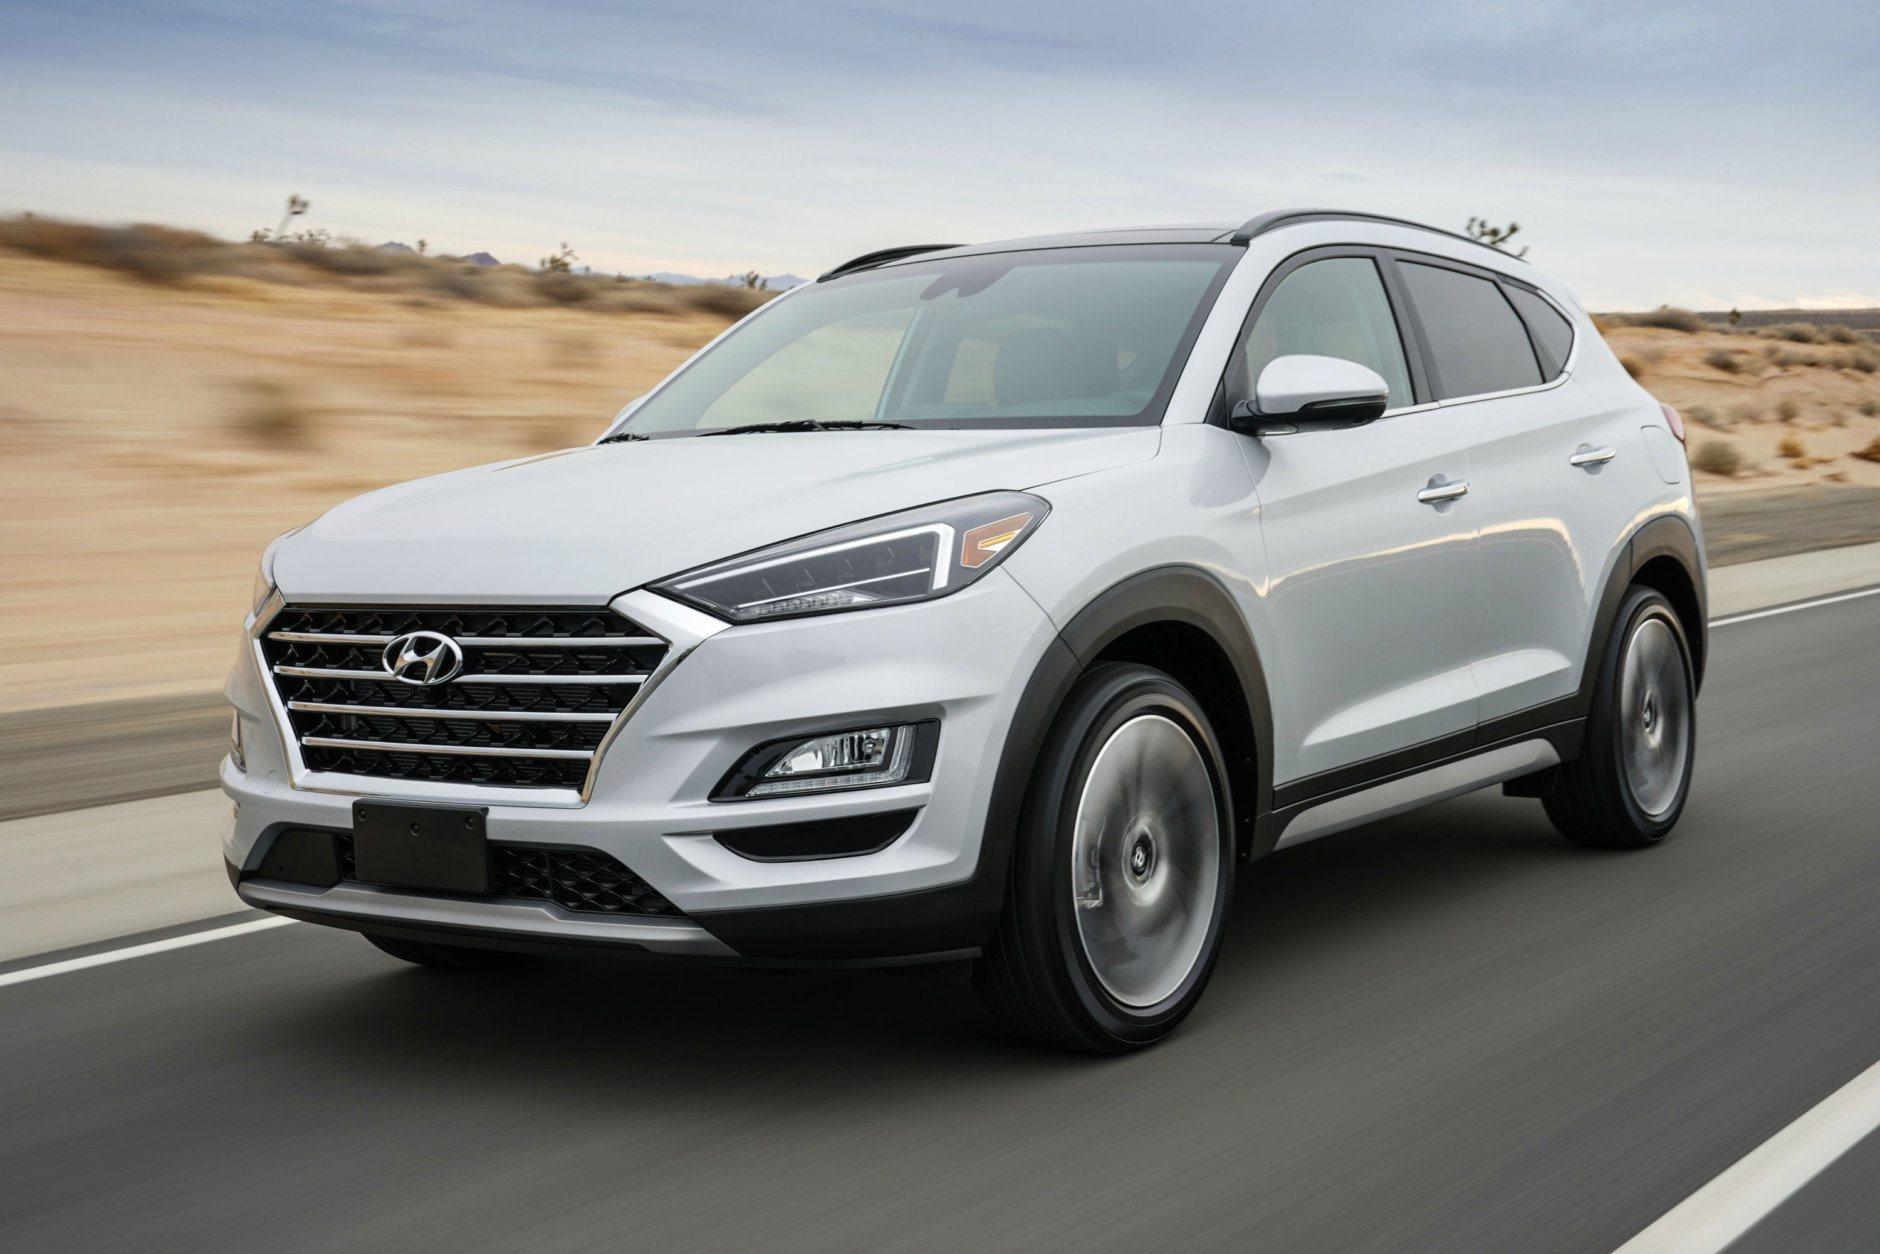 2019 Hyundai Tucson Purchase Deal: Up to $3,000 cash back (Courtesy Hyundai Motor America)